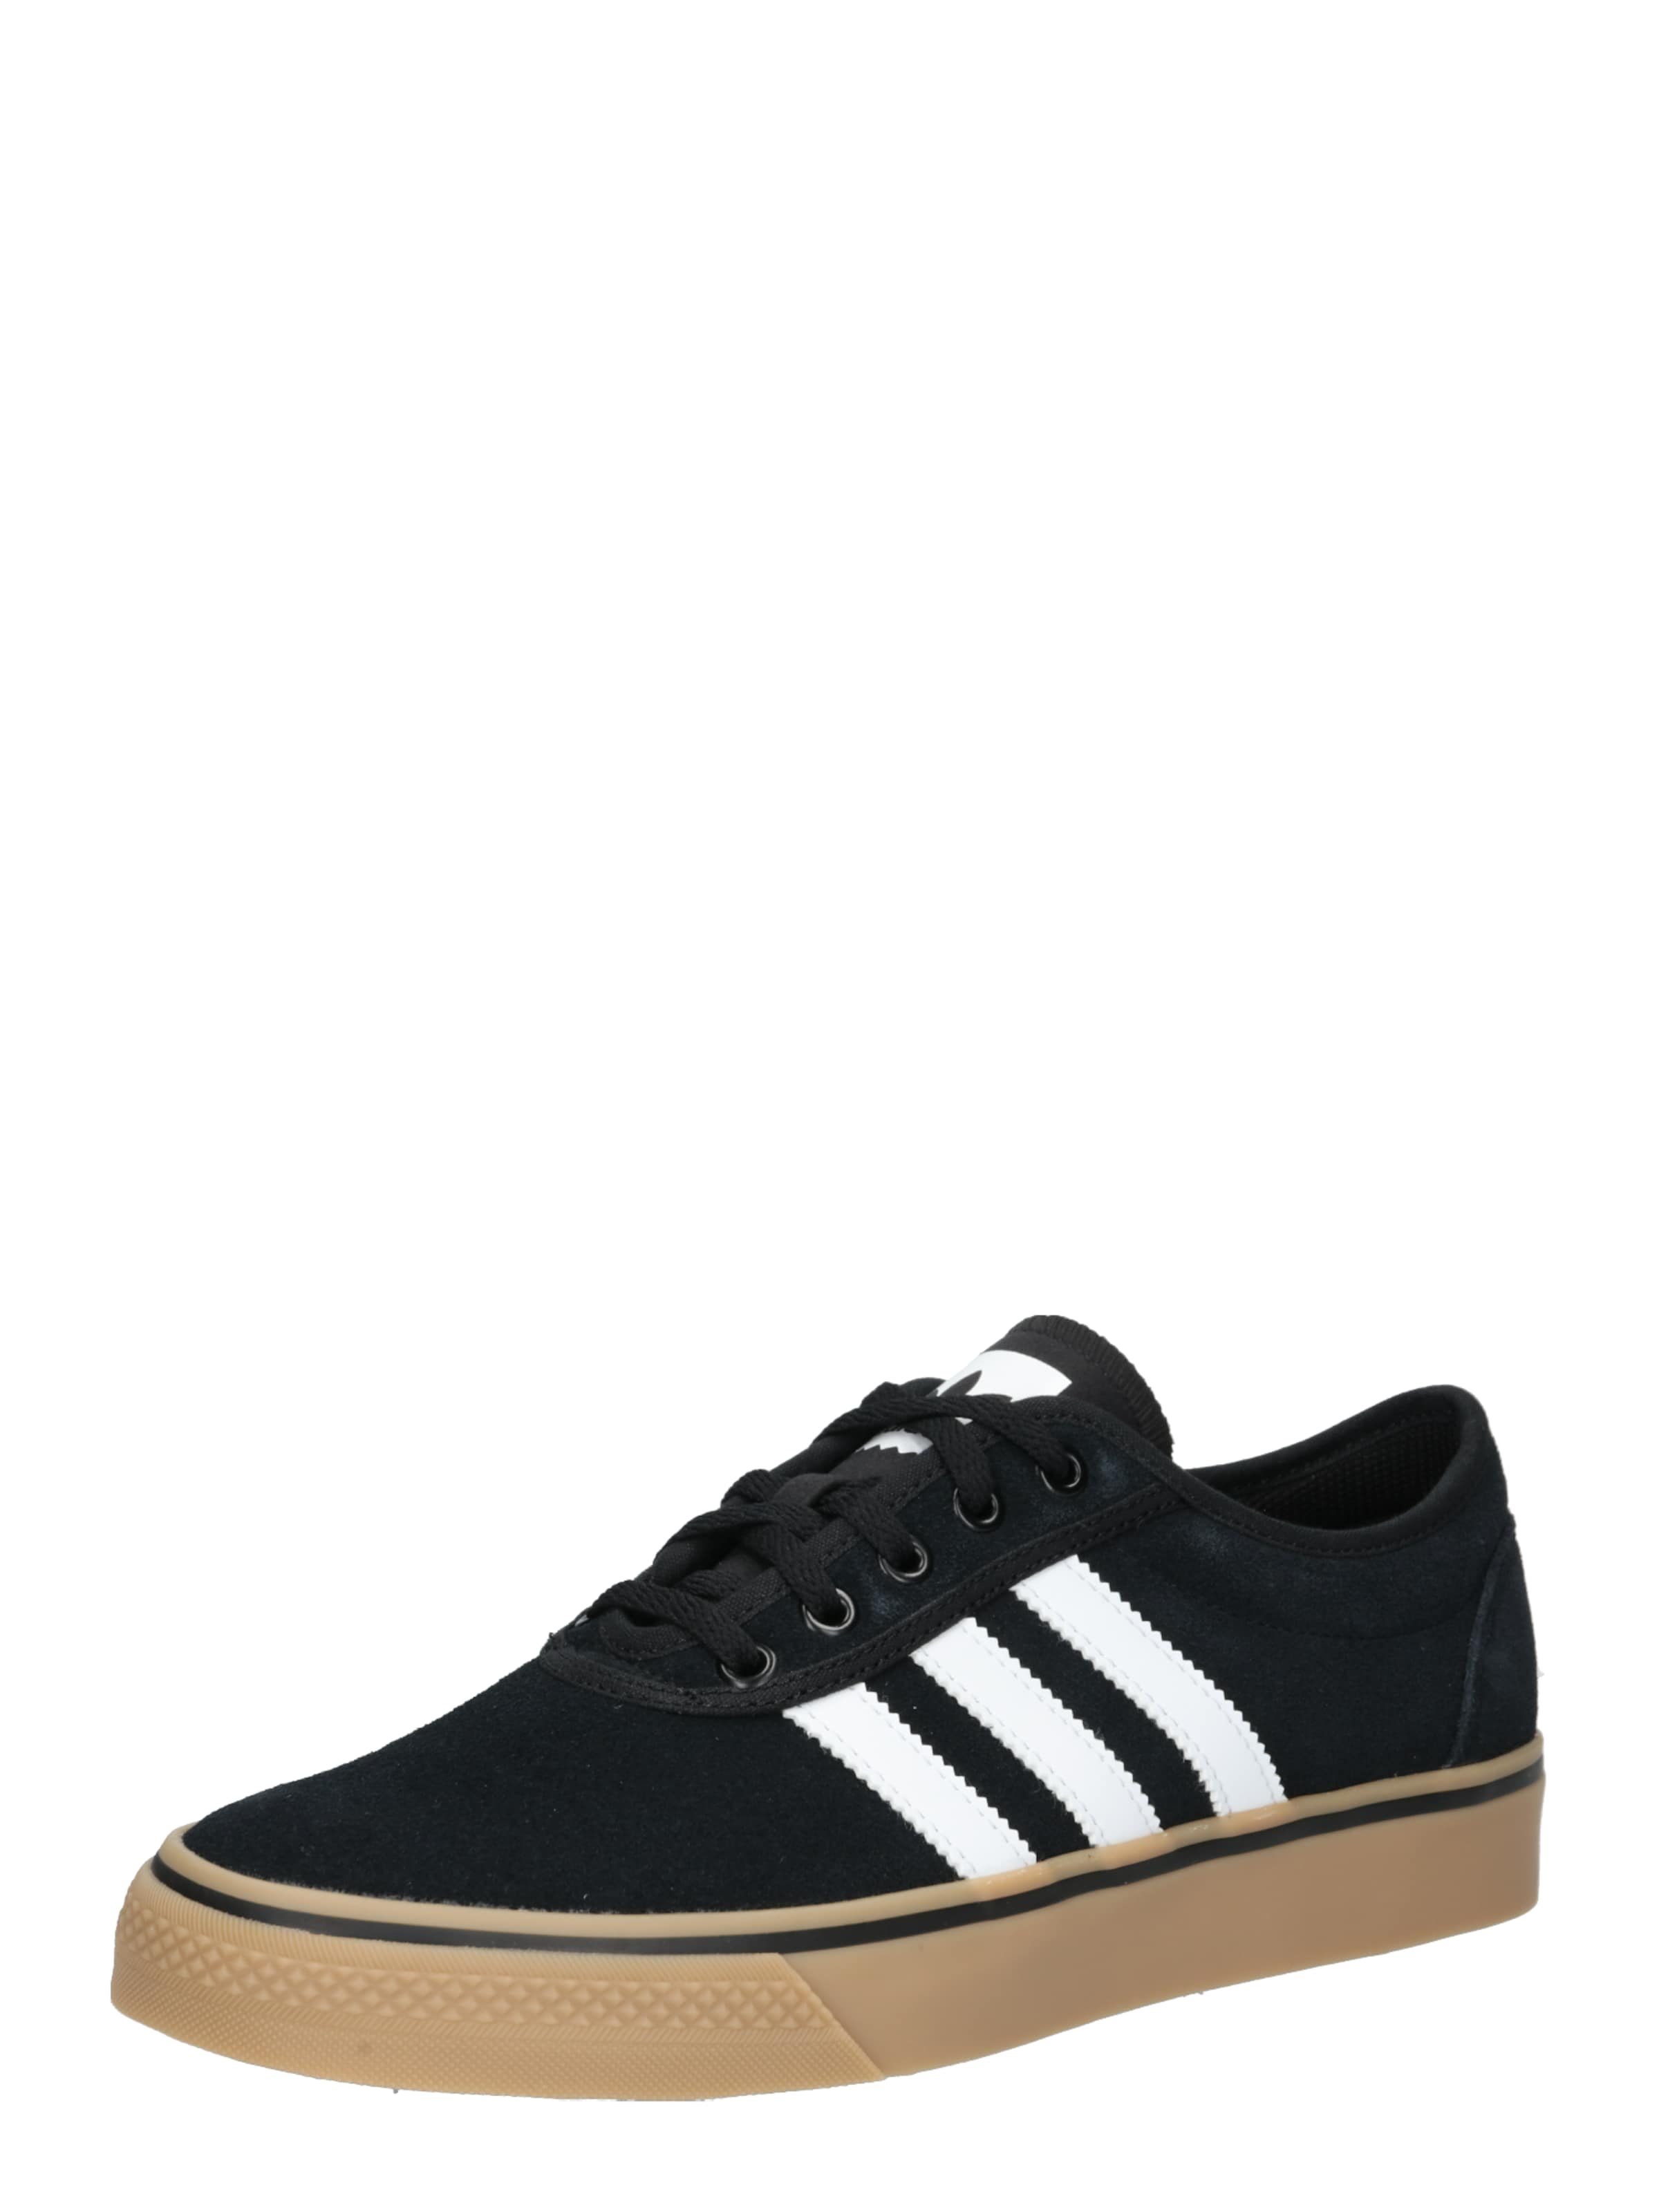 ease' 'adi En Adidas NoirBlanc Originals Basses Baskets KF3l1cTJ